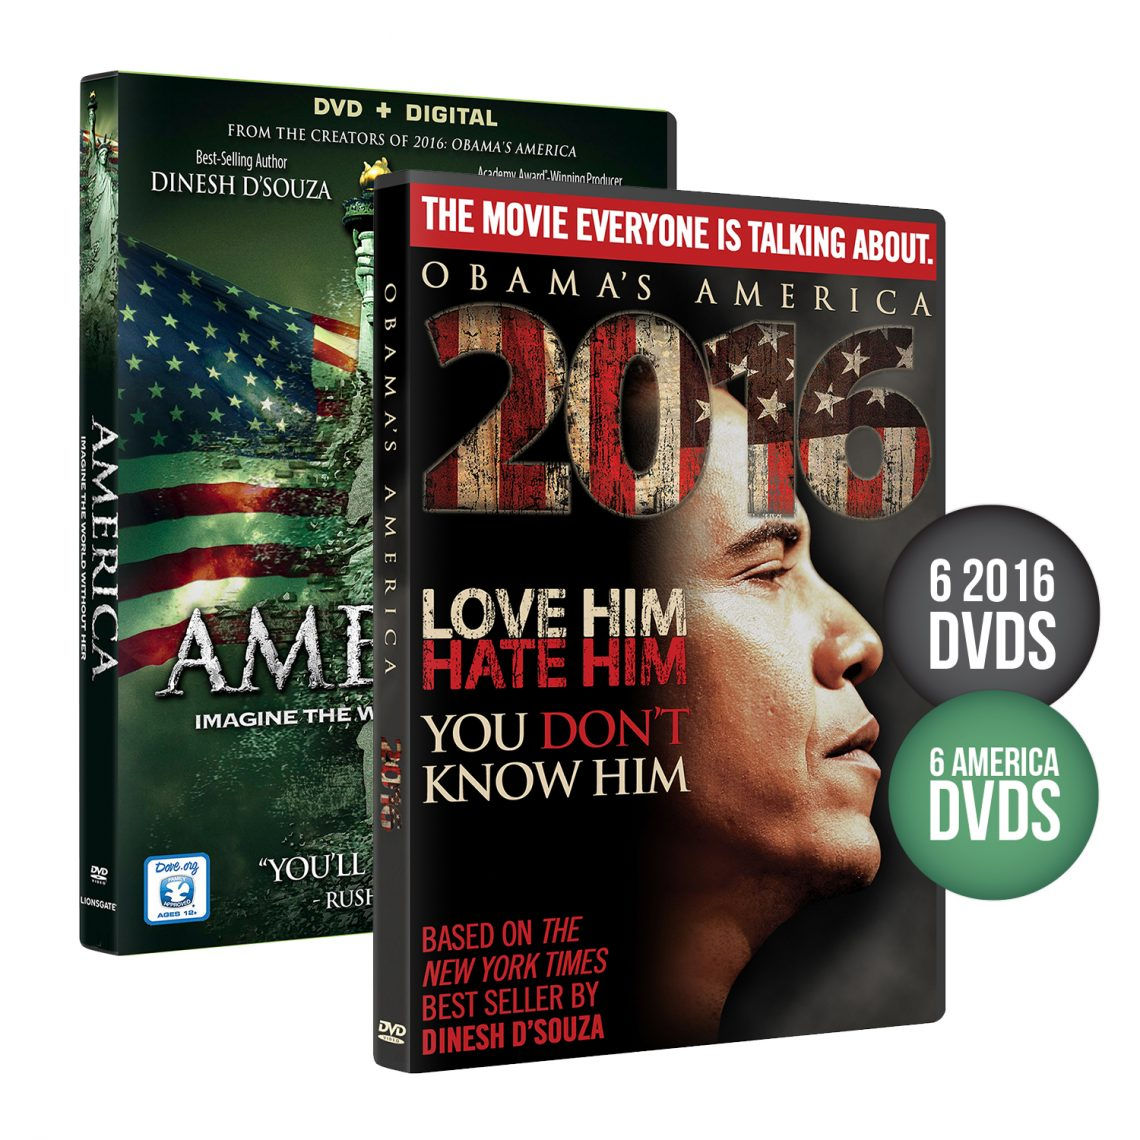 6-america-dvds-62016-dvds_2